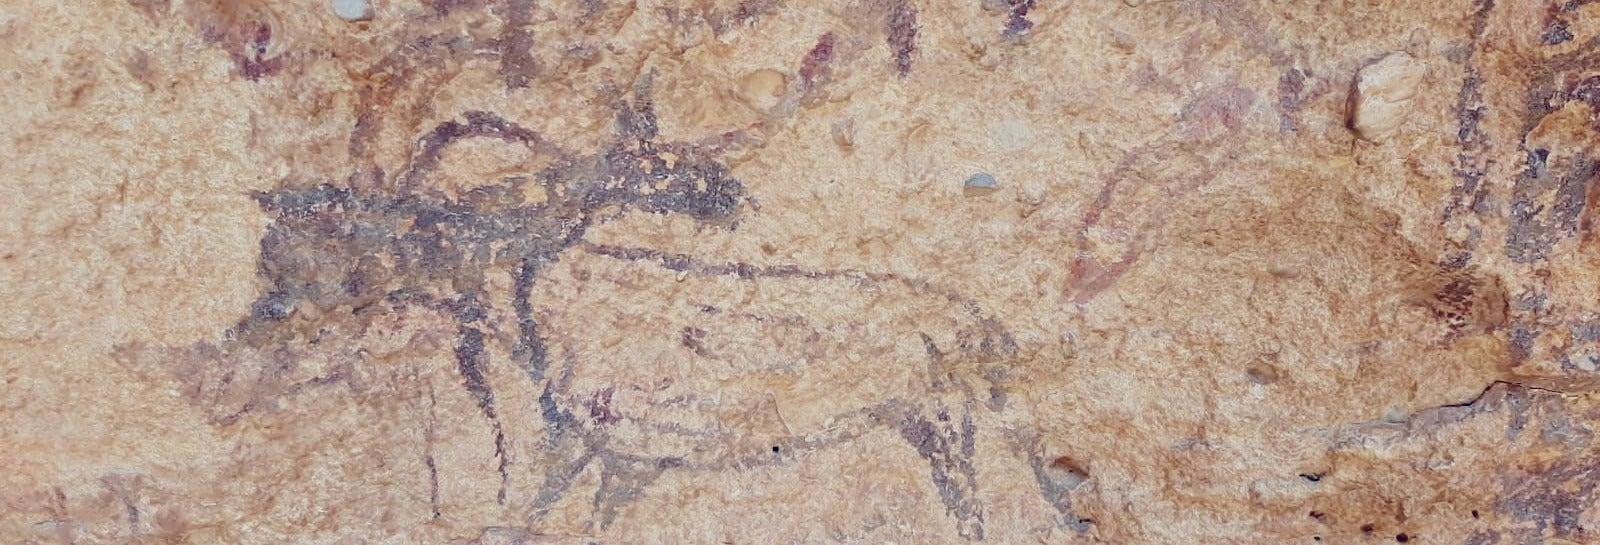 Tour por las pinturas rupestres de Minateda